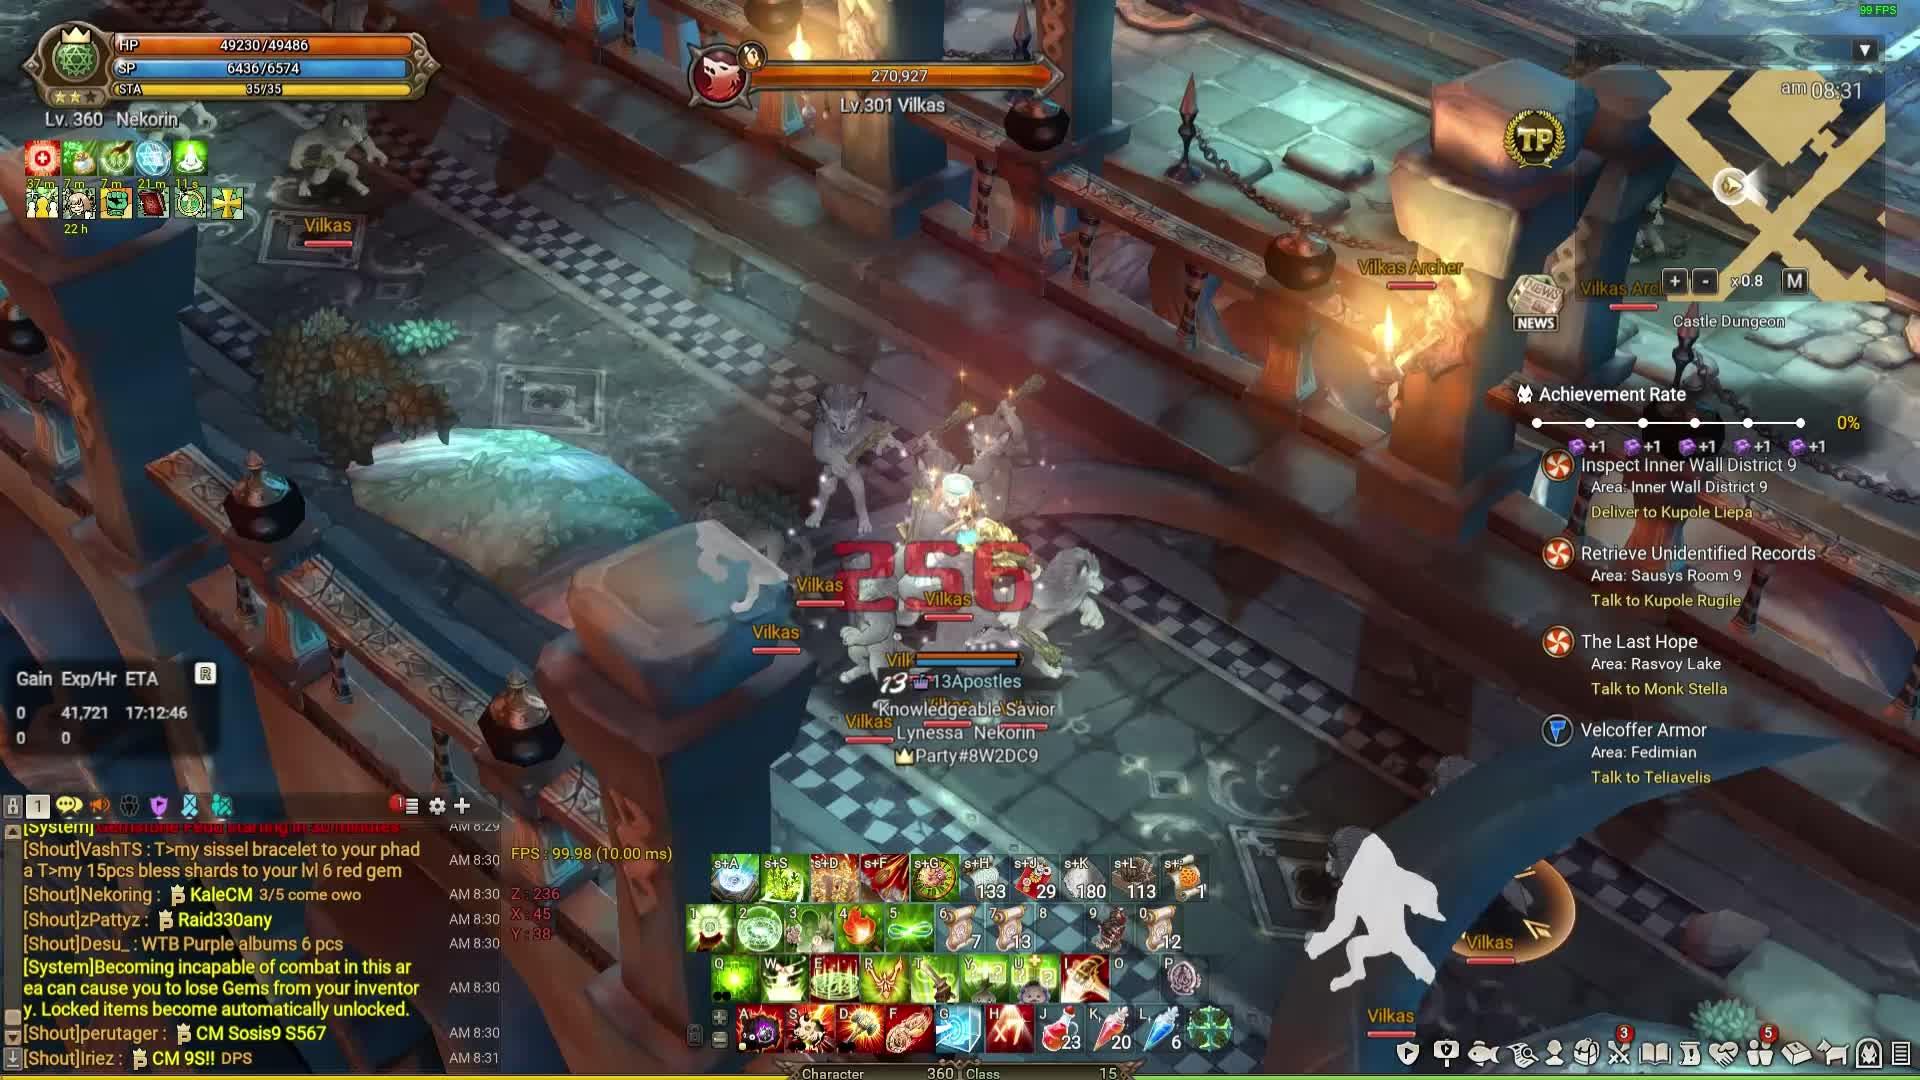 Druid, Inquisitor, Tree of Savior, 2018-07-14 20-39-57 GIFs